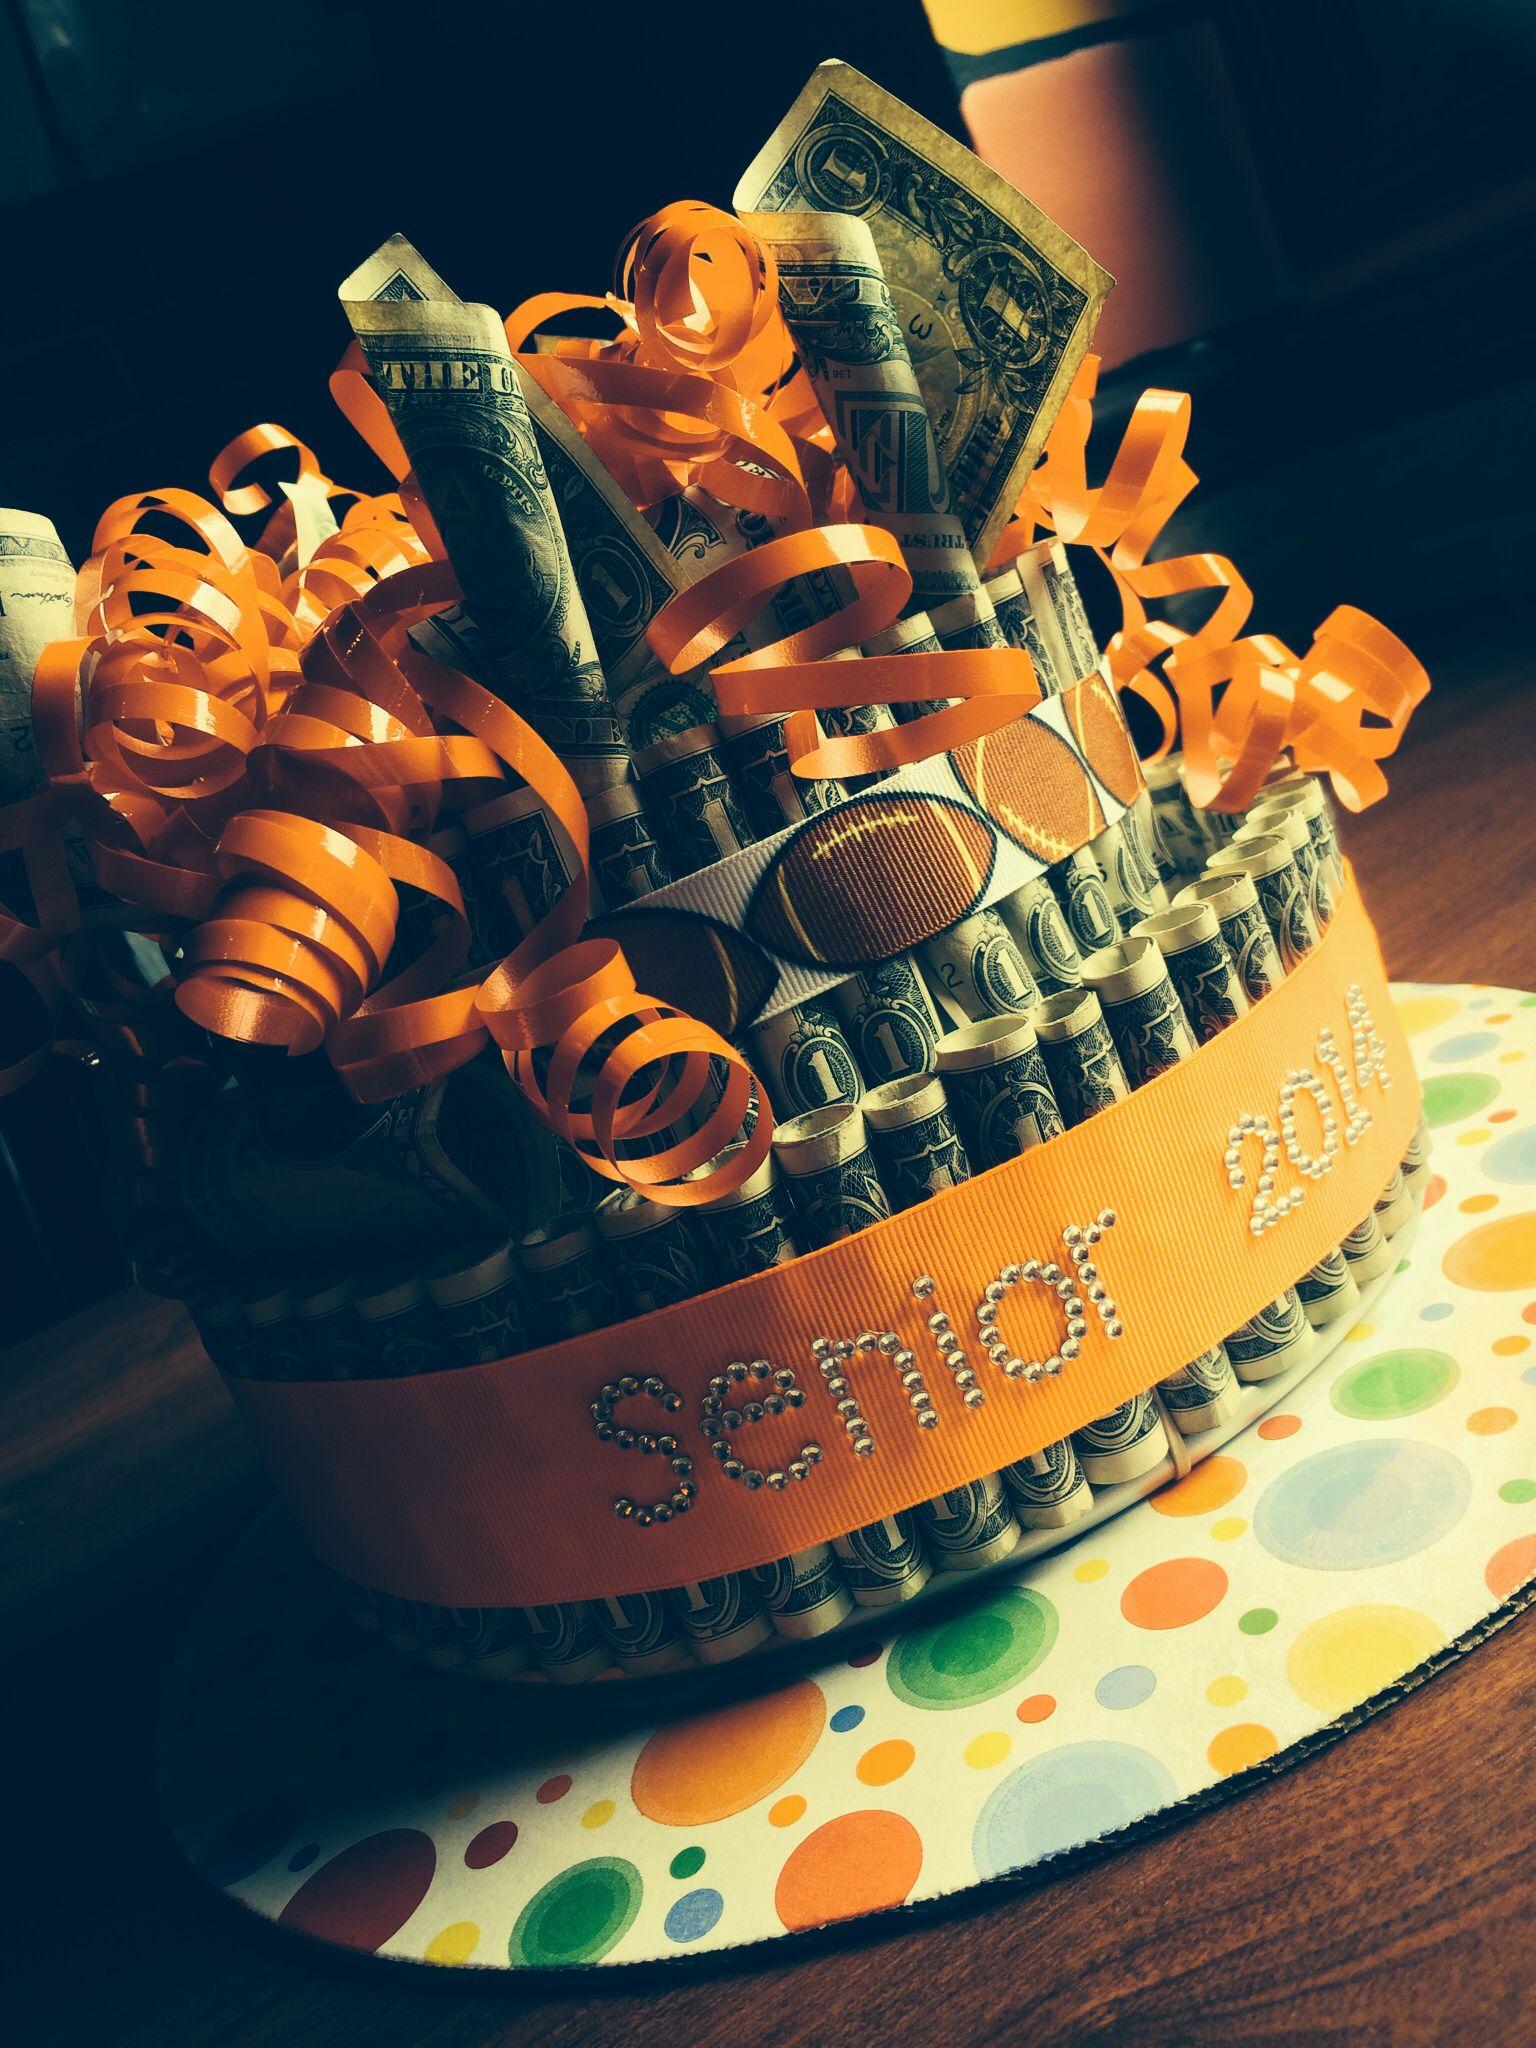 Graduation money cake ideas 66848 graduation money cake bo - Money cake decorations ...